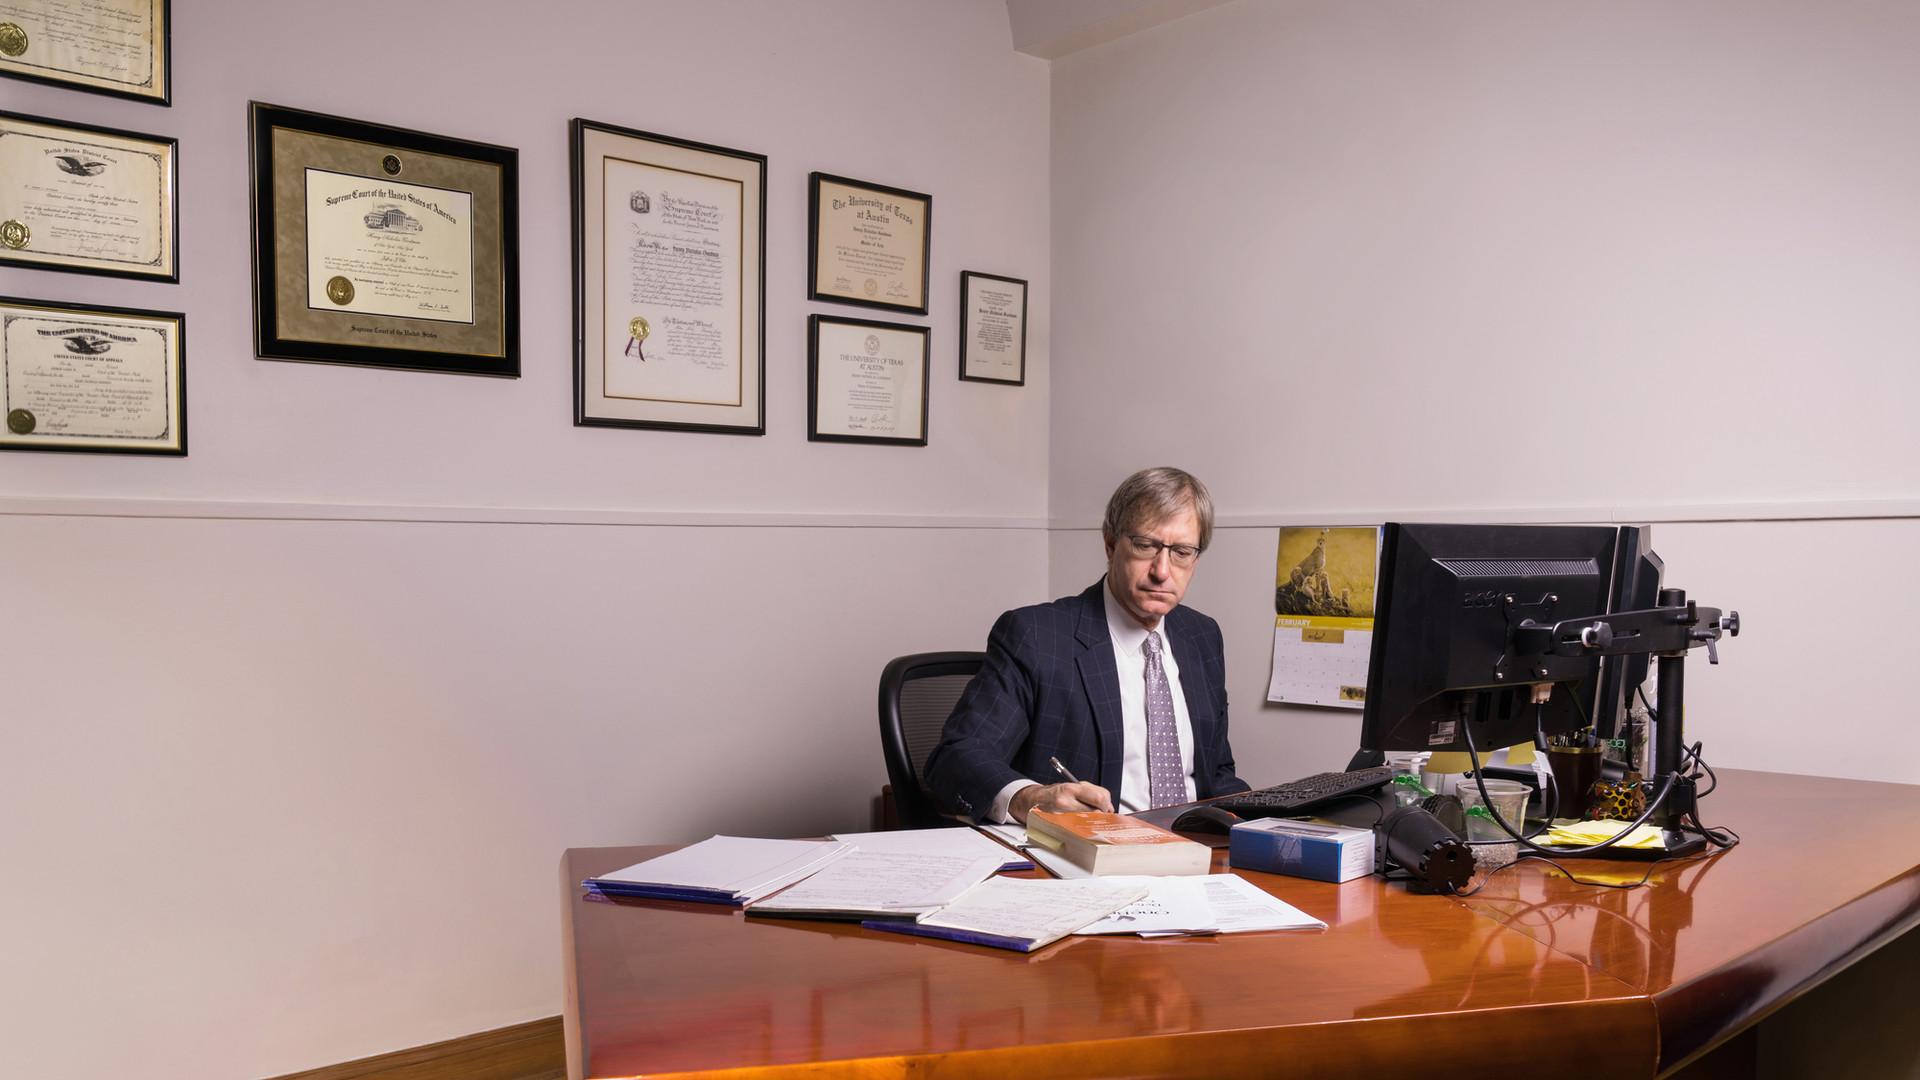 Nicholas Goodman at Work